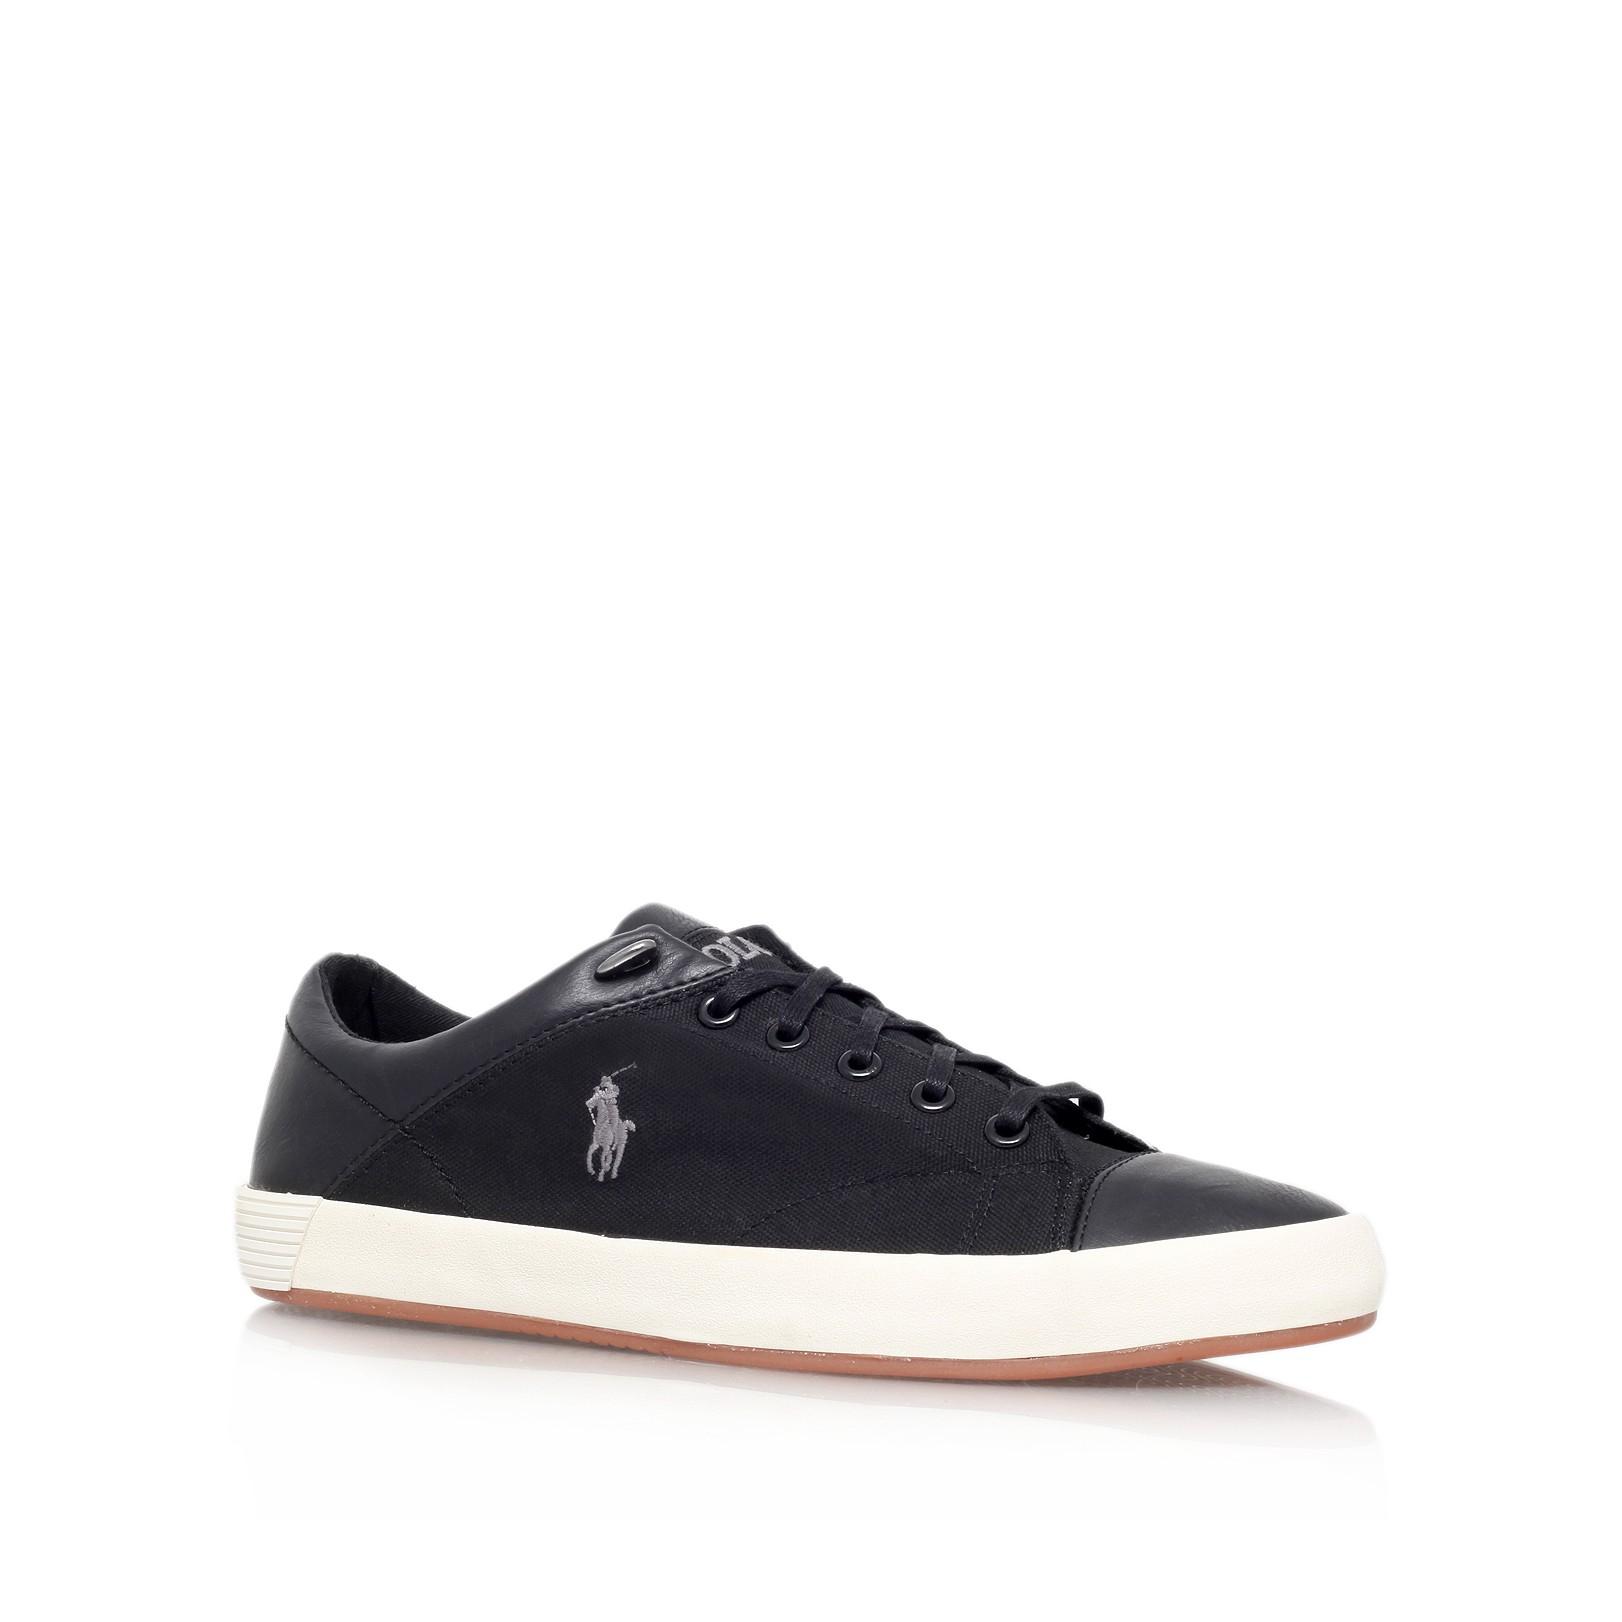 polo ralph lauren jerome toecap sneaker in black lyst. Black Bedroom Furniture Sets. Home Design Ideas